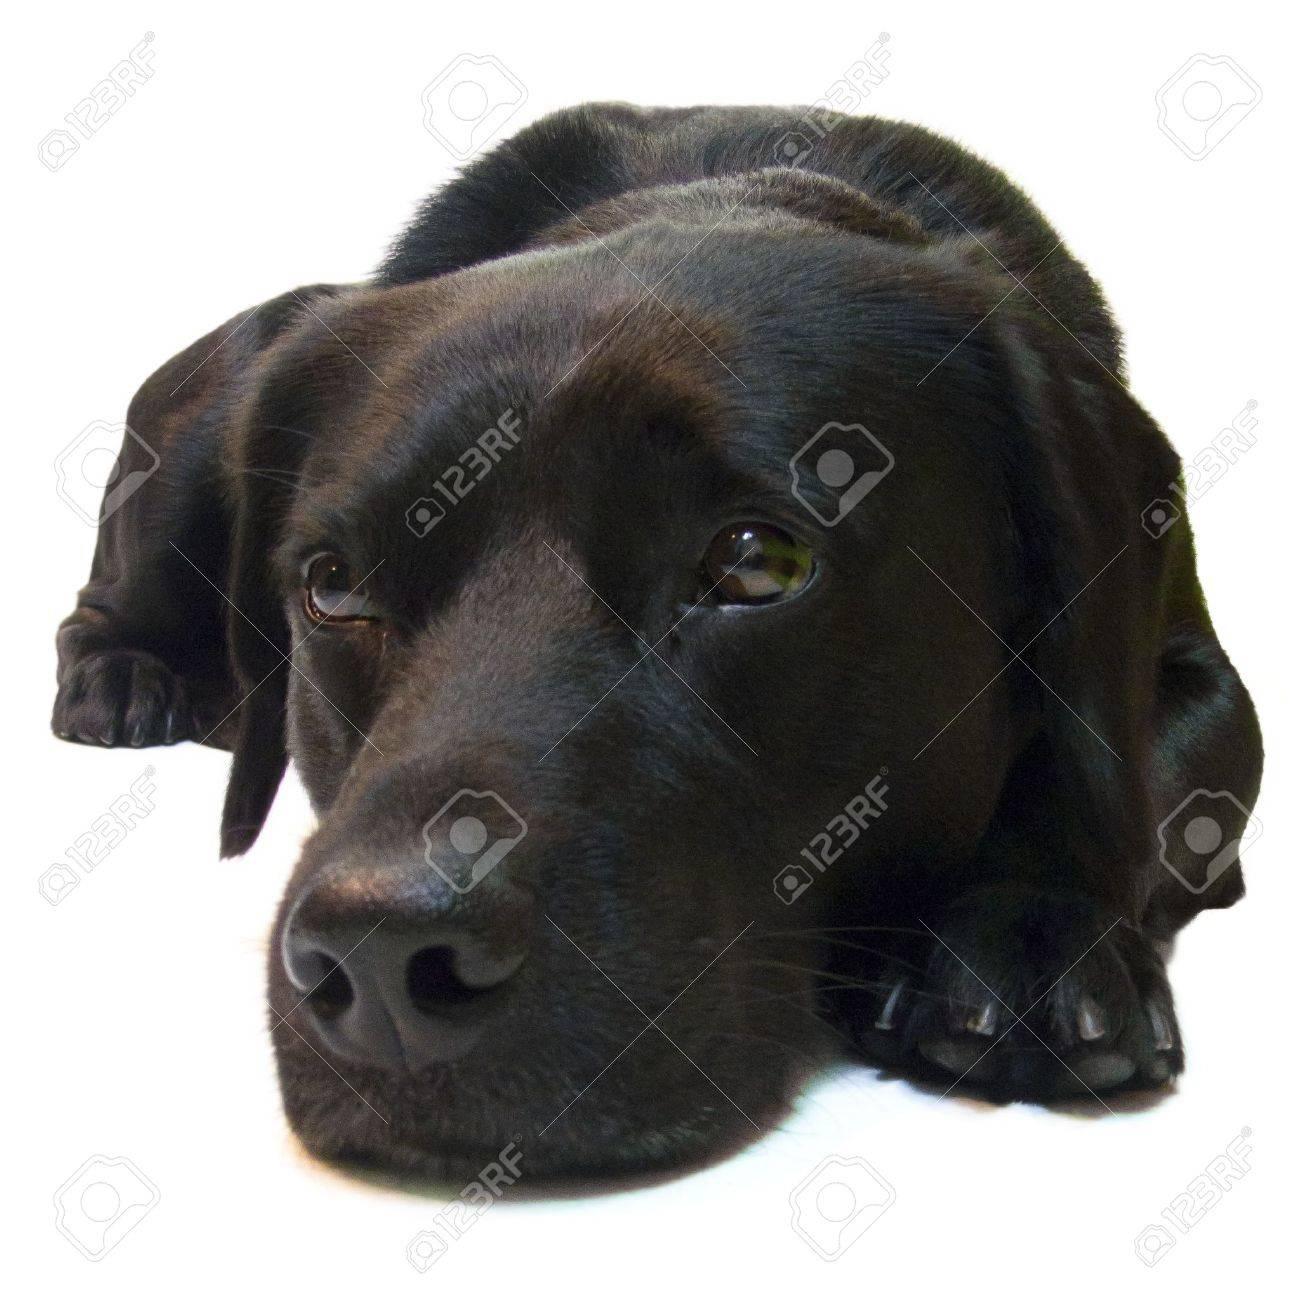 sad black dog labrador retriever on white background stock photo